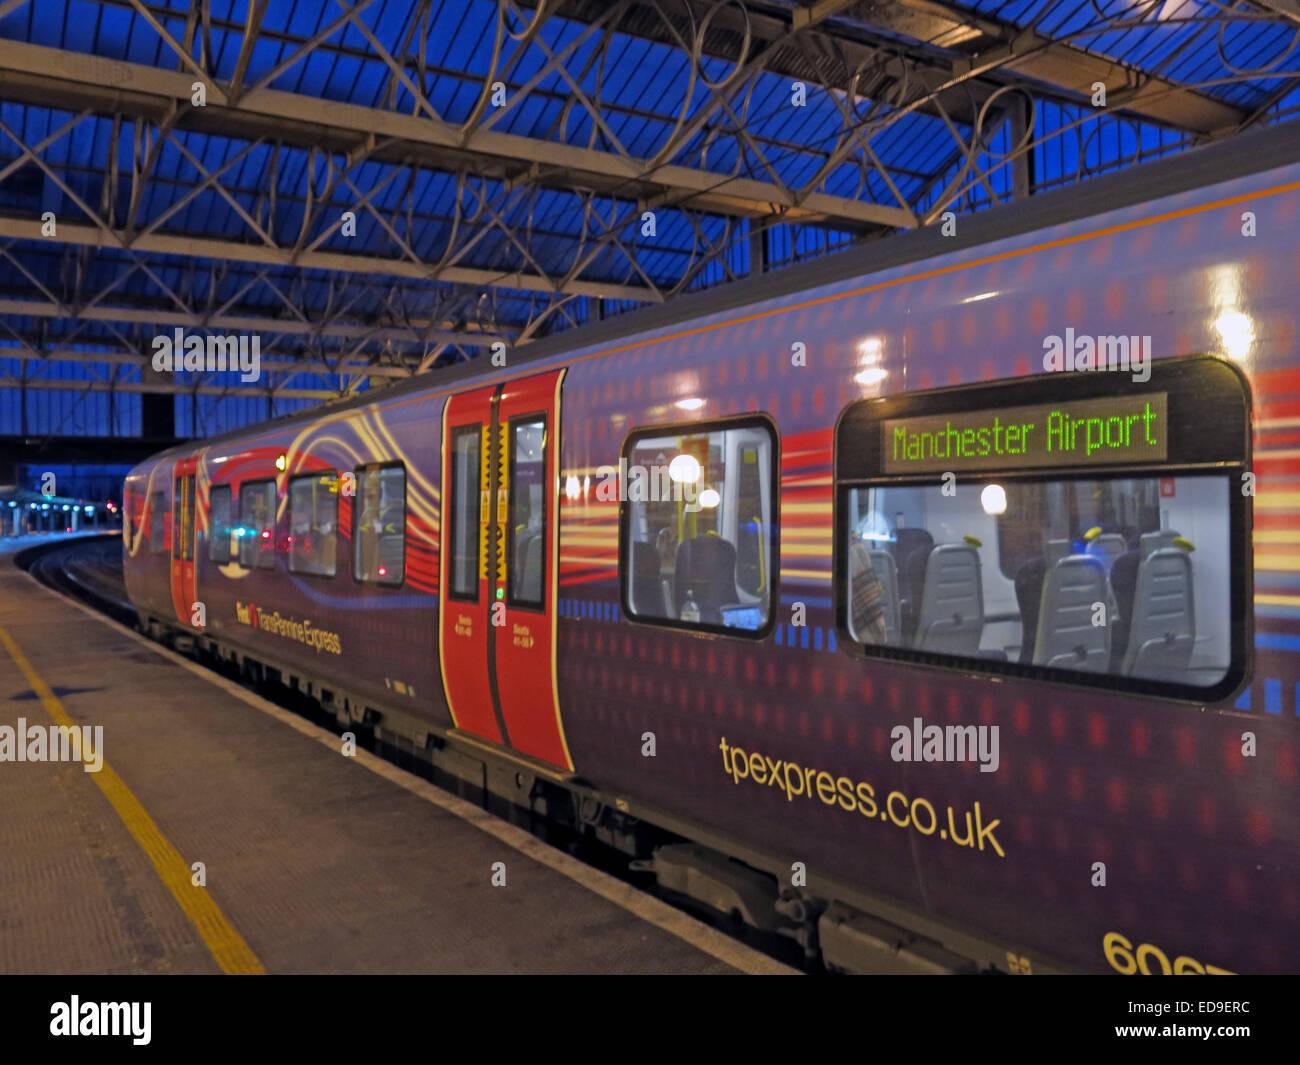 Airport,at,dusk,at,Carlisle,station,purple,platform,night,BR,British,rail,franchise,privatised,privitisation,doors,closed,express,Cumbria,transport,travel,GoTonySmith,Buy Pictures of,Buy Images Of